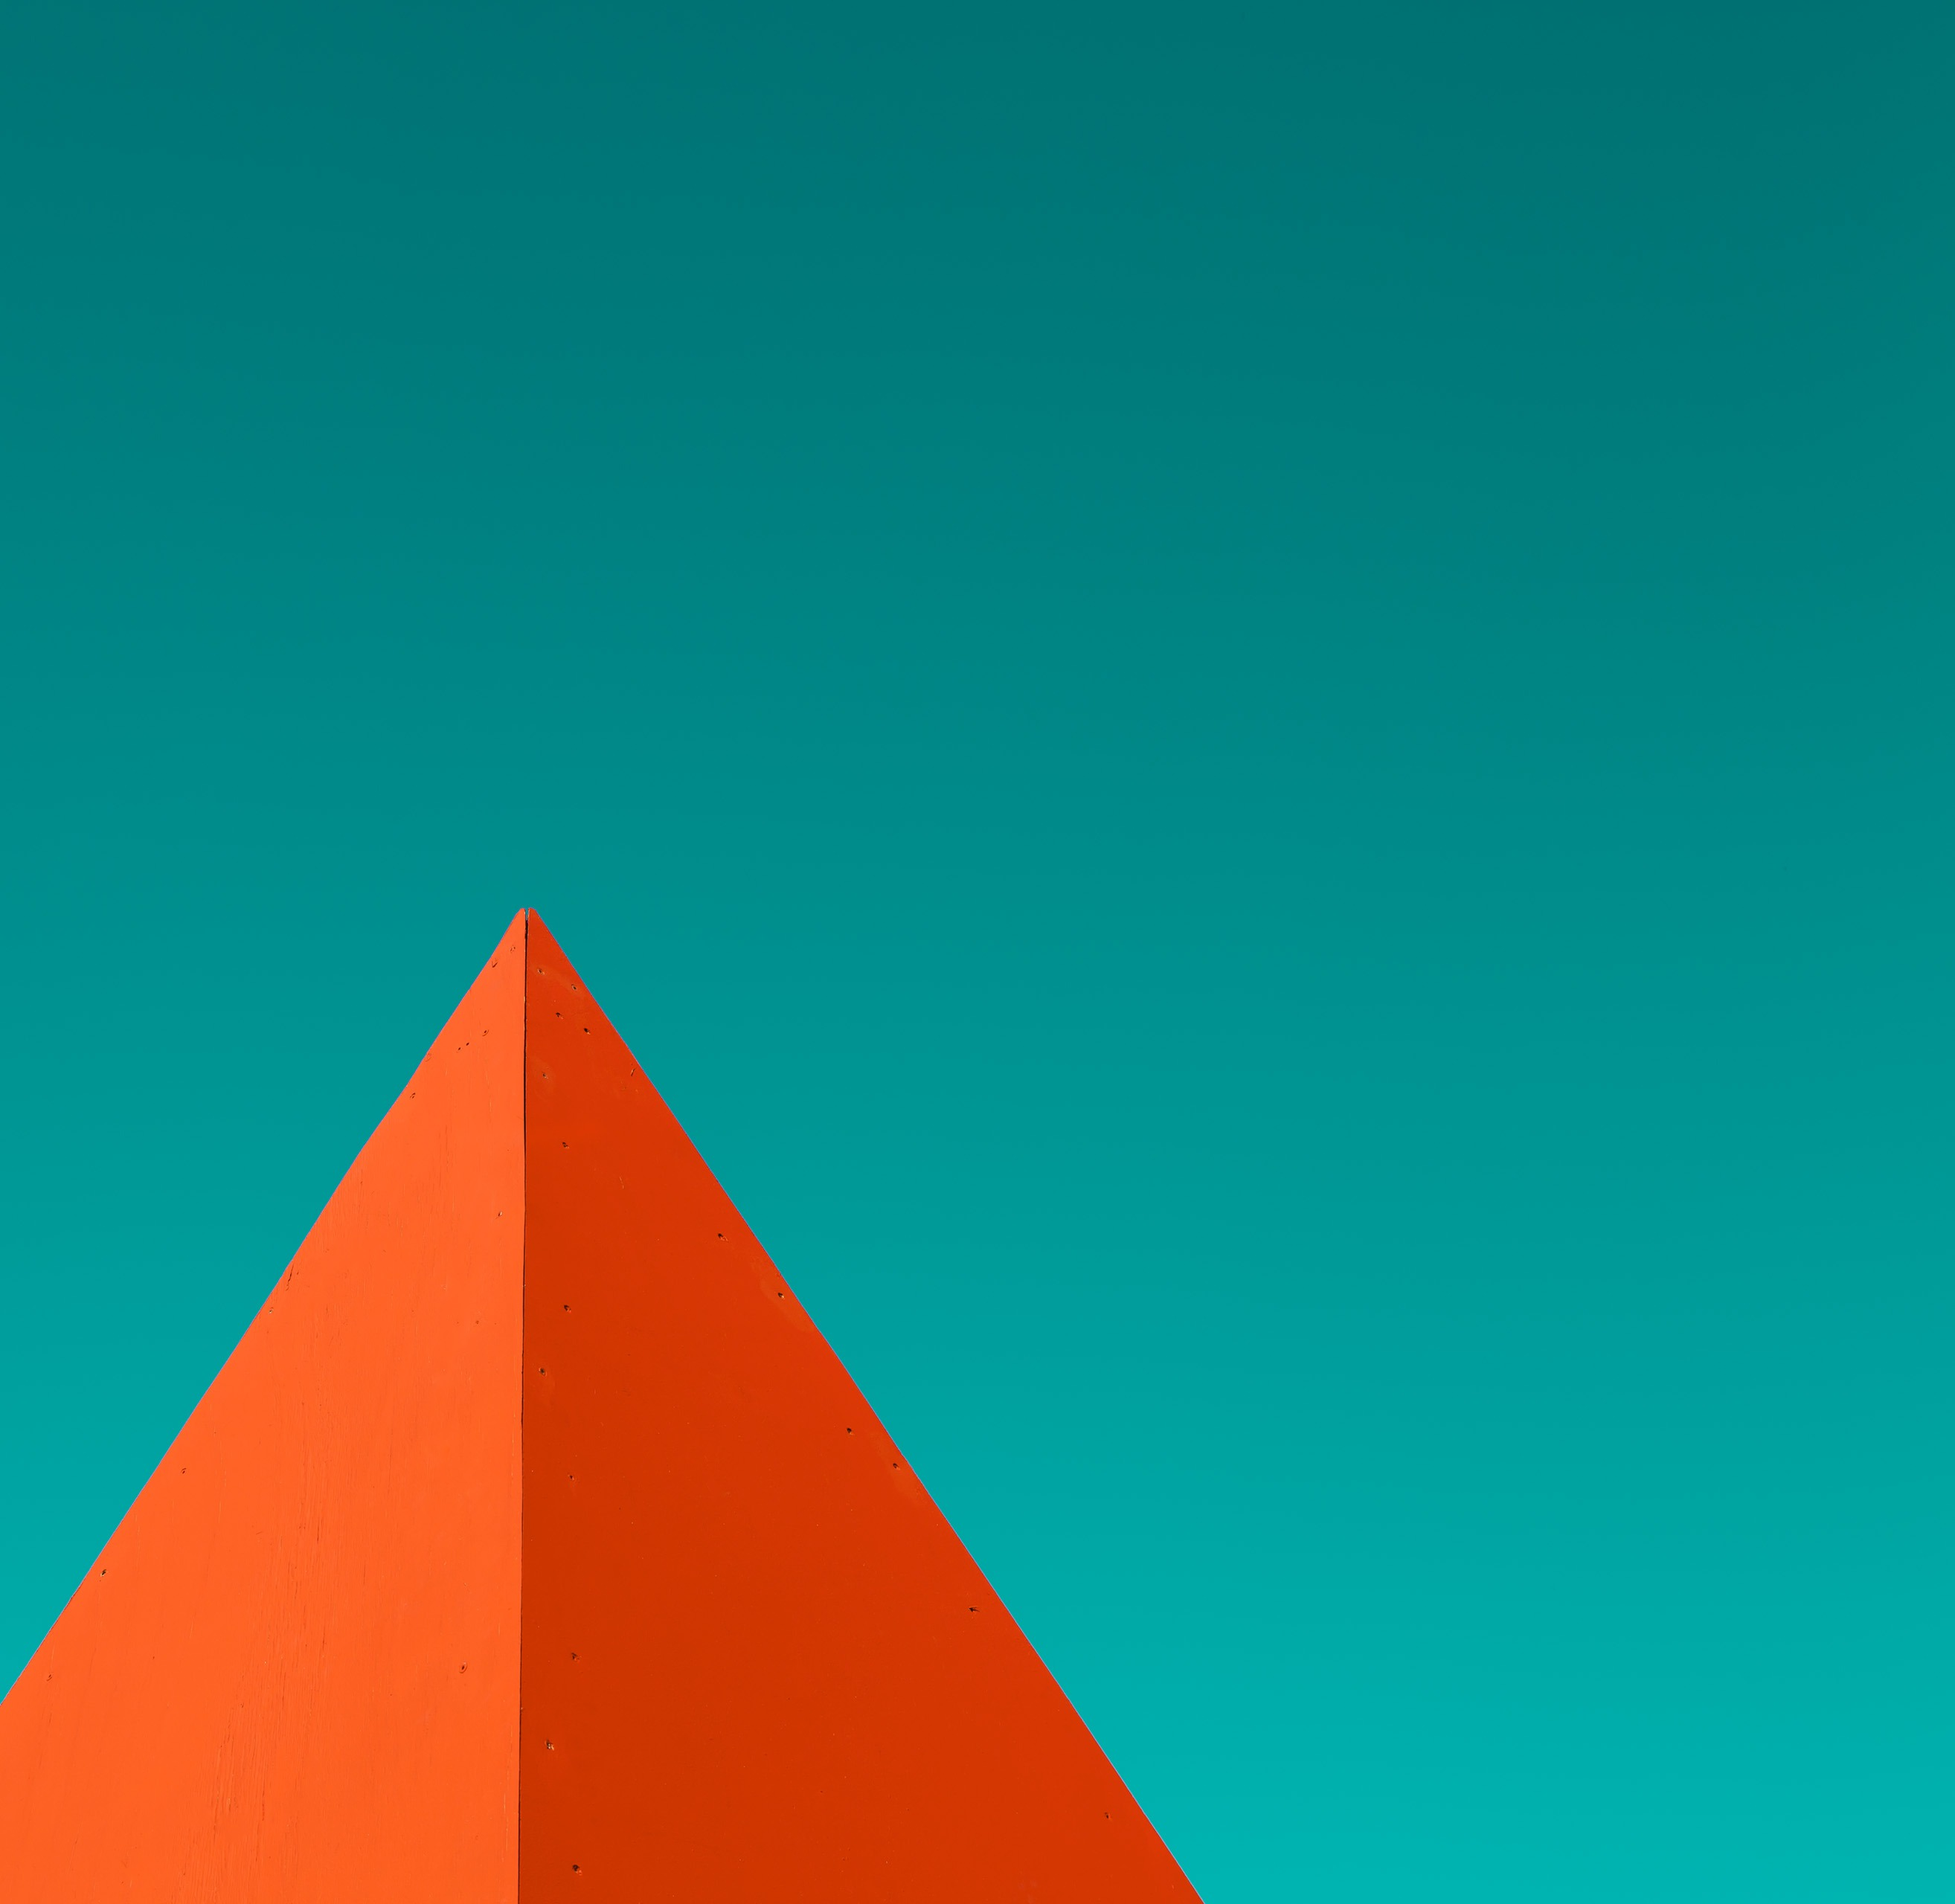 74 ] Nexus Wallpaper Android On WallpaperSafari